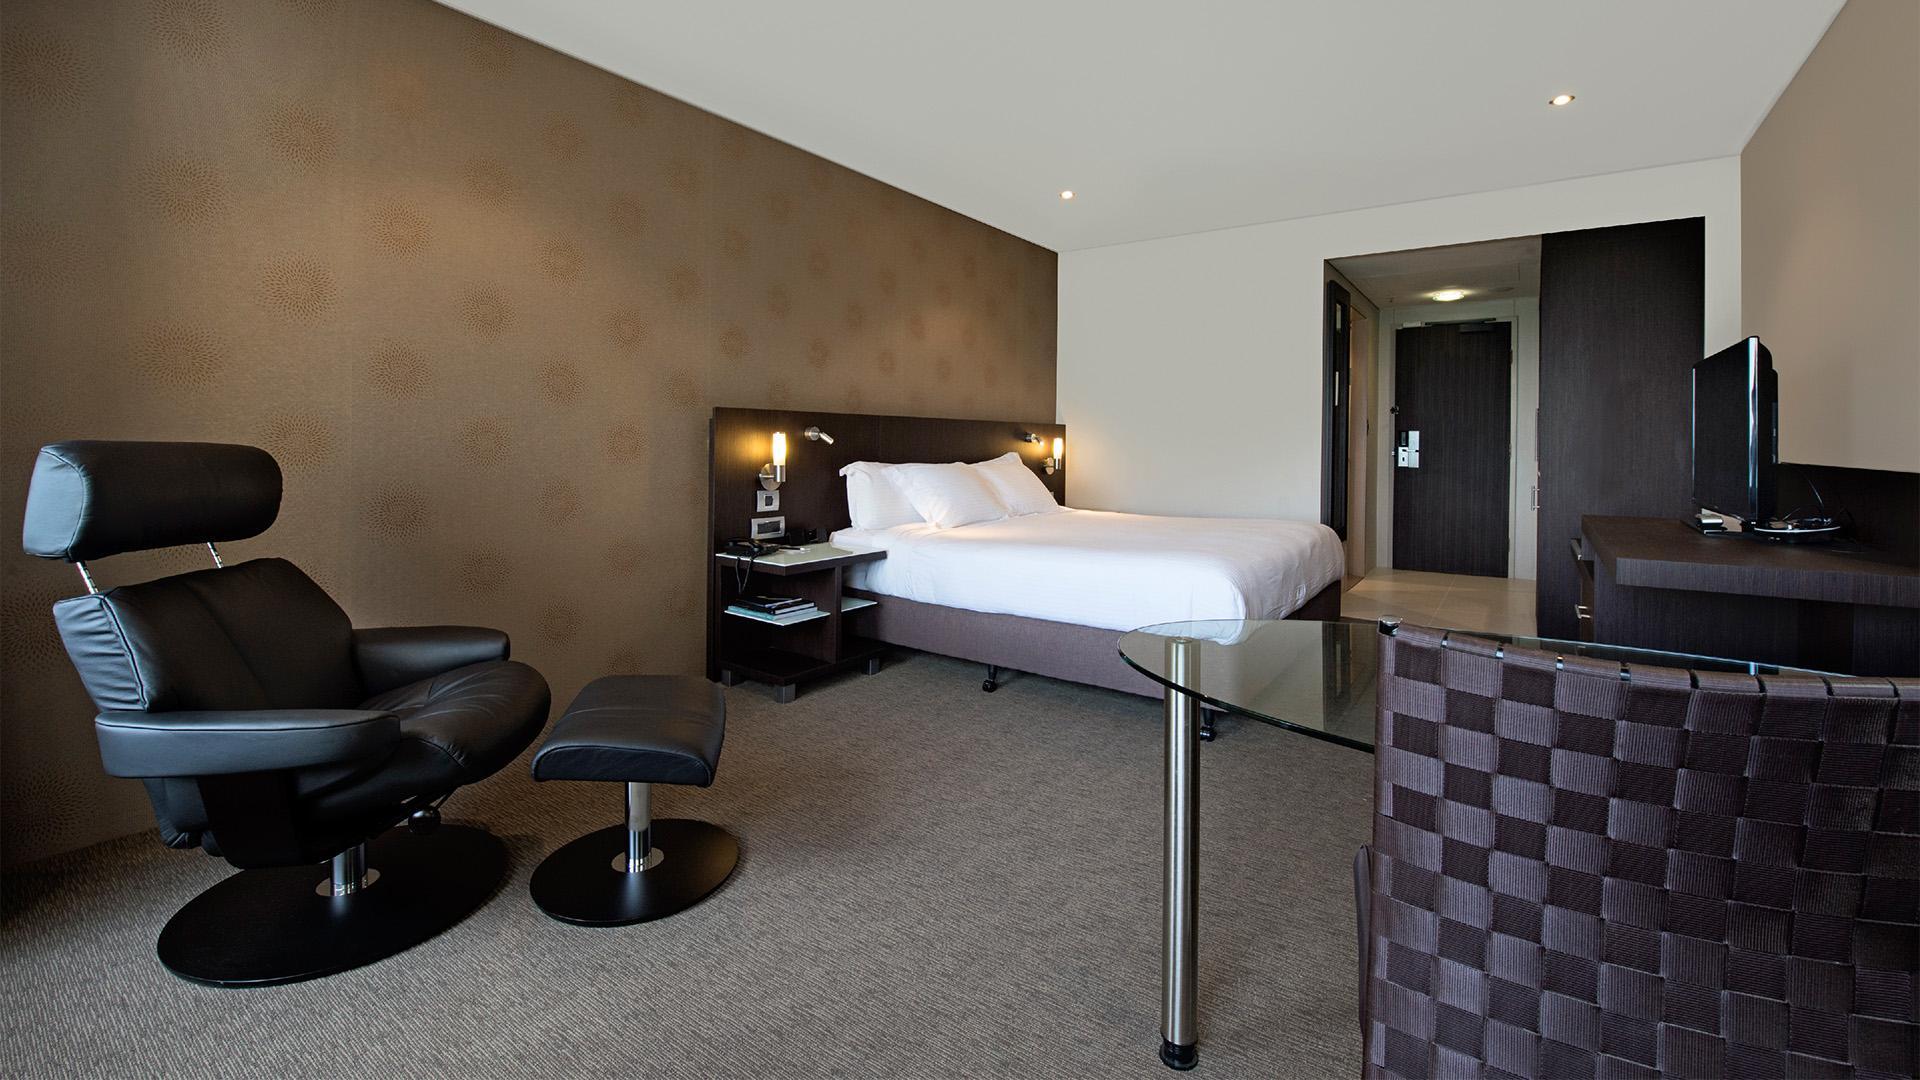 King Executive Room image 1 at Hilton Darwin by Darwin Municipality, Northern Territory, Australia